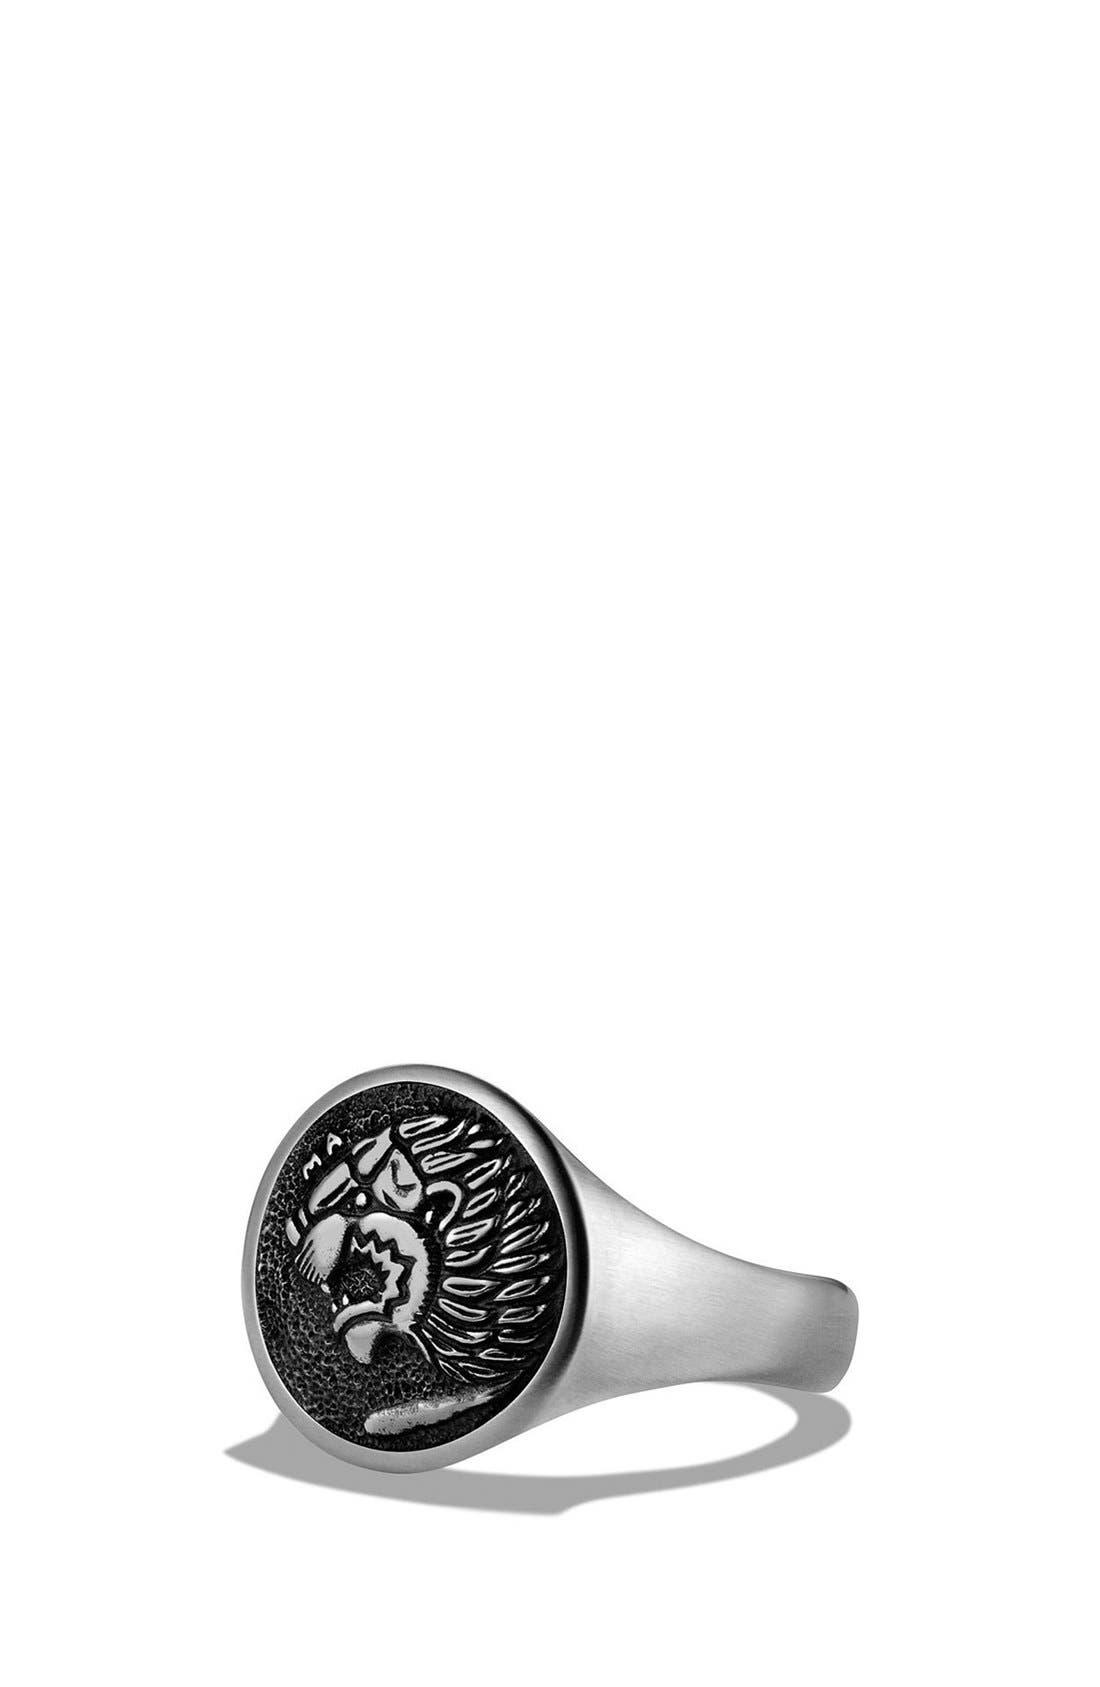 David Yurman 'Petrvs' Lion Signet Pinky Ring